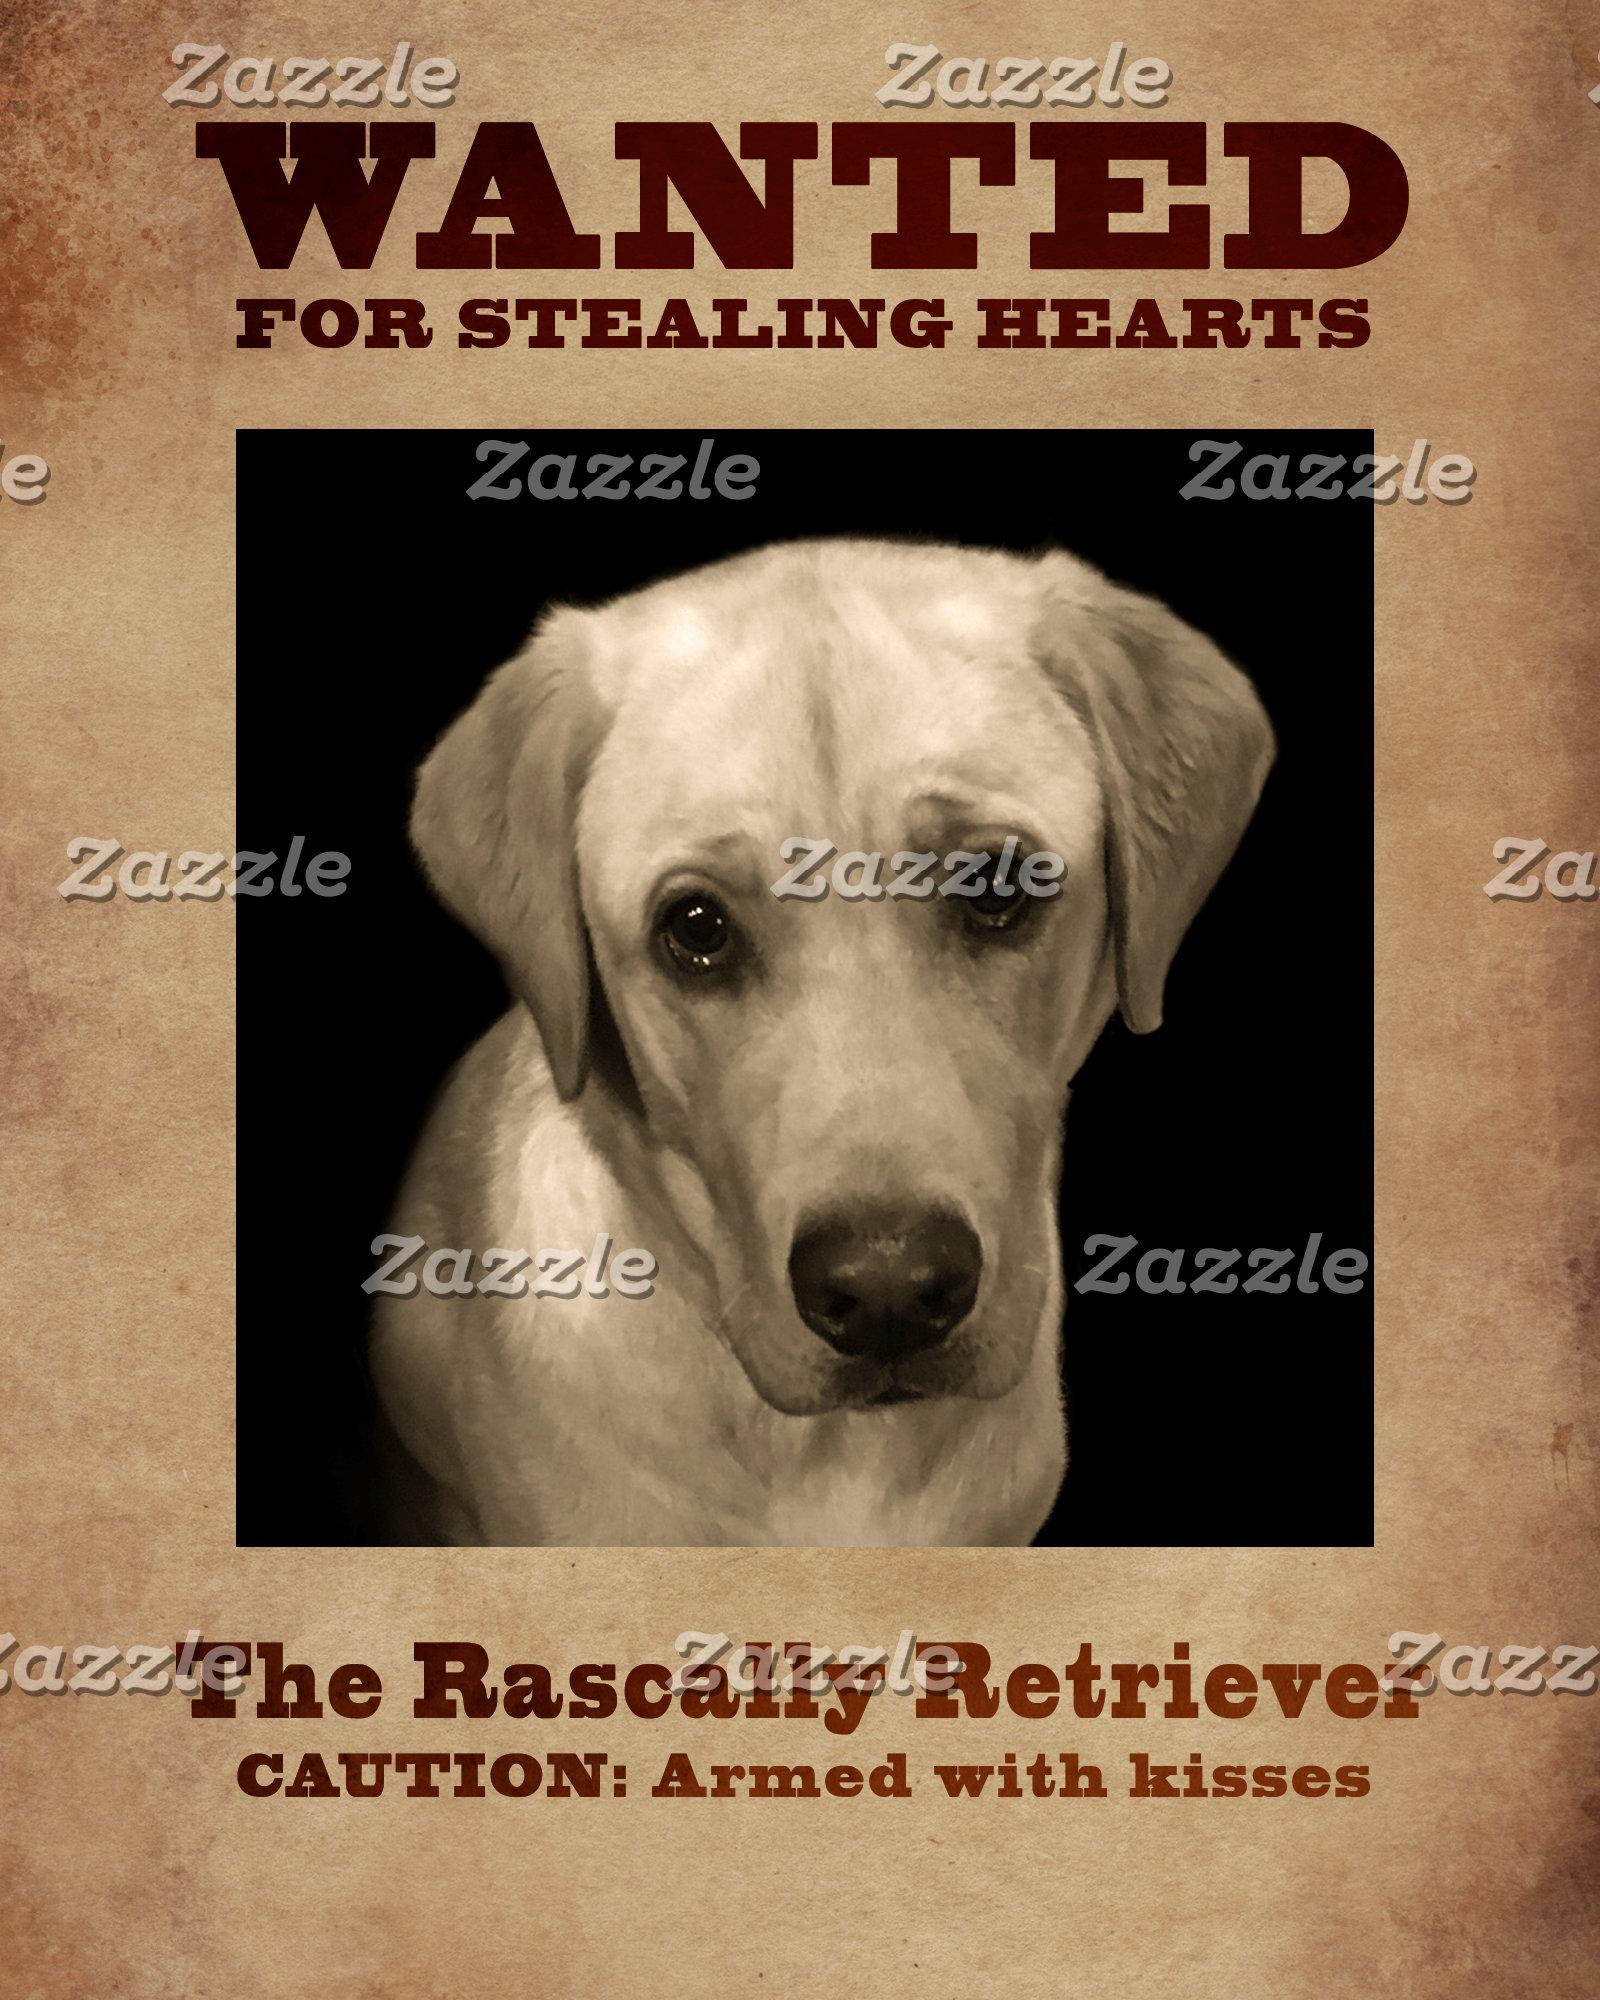 The Rascally Retriever